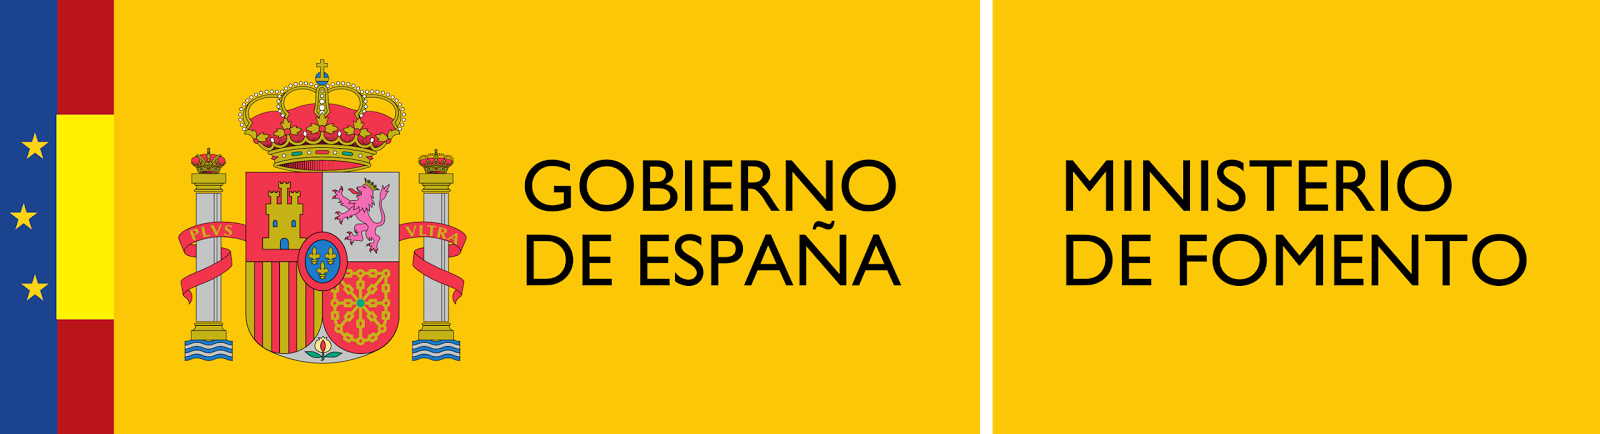 http://www.fomento.es/MFOM/LANG_CASTELLANO/DIRECCIONES_GENERALES/INSTITUTO_GEOGRAFICO/Astronomia/publico/efemerides/primavera.htm